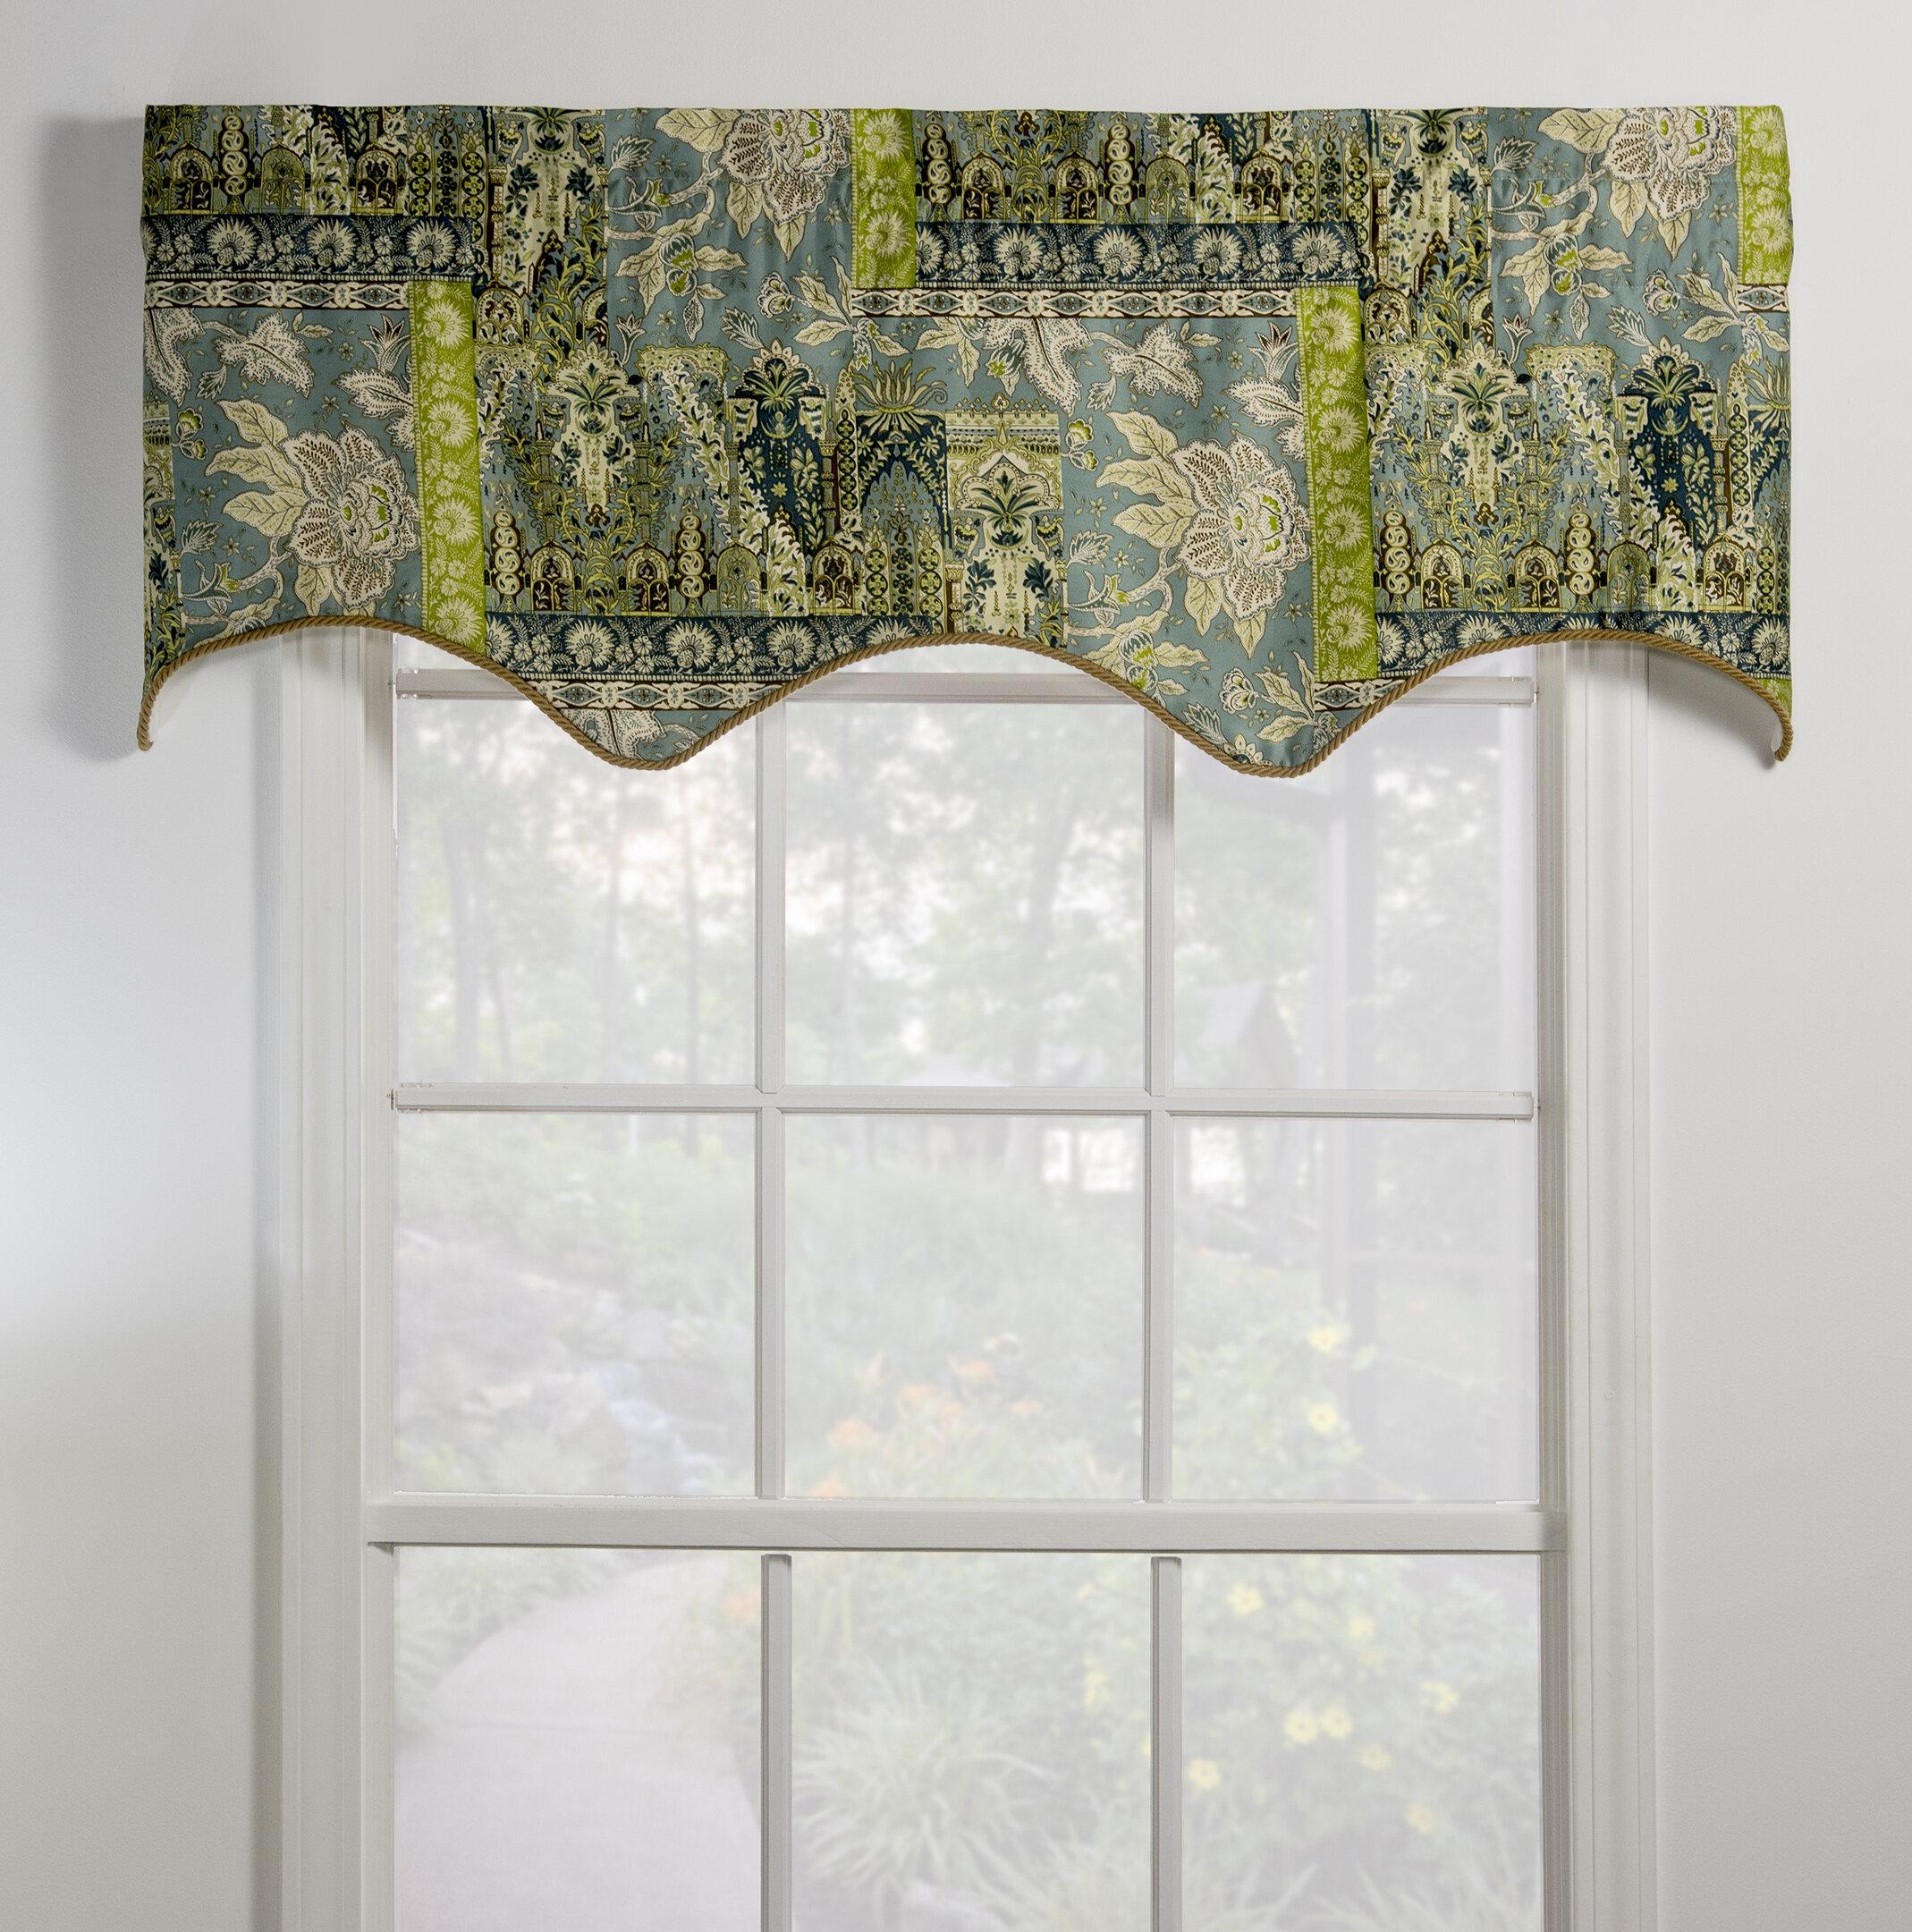 Thomasville At Home Tangier Lined Empress Filler 50 Window Valance Wayfair